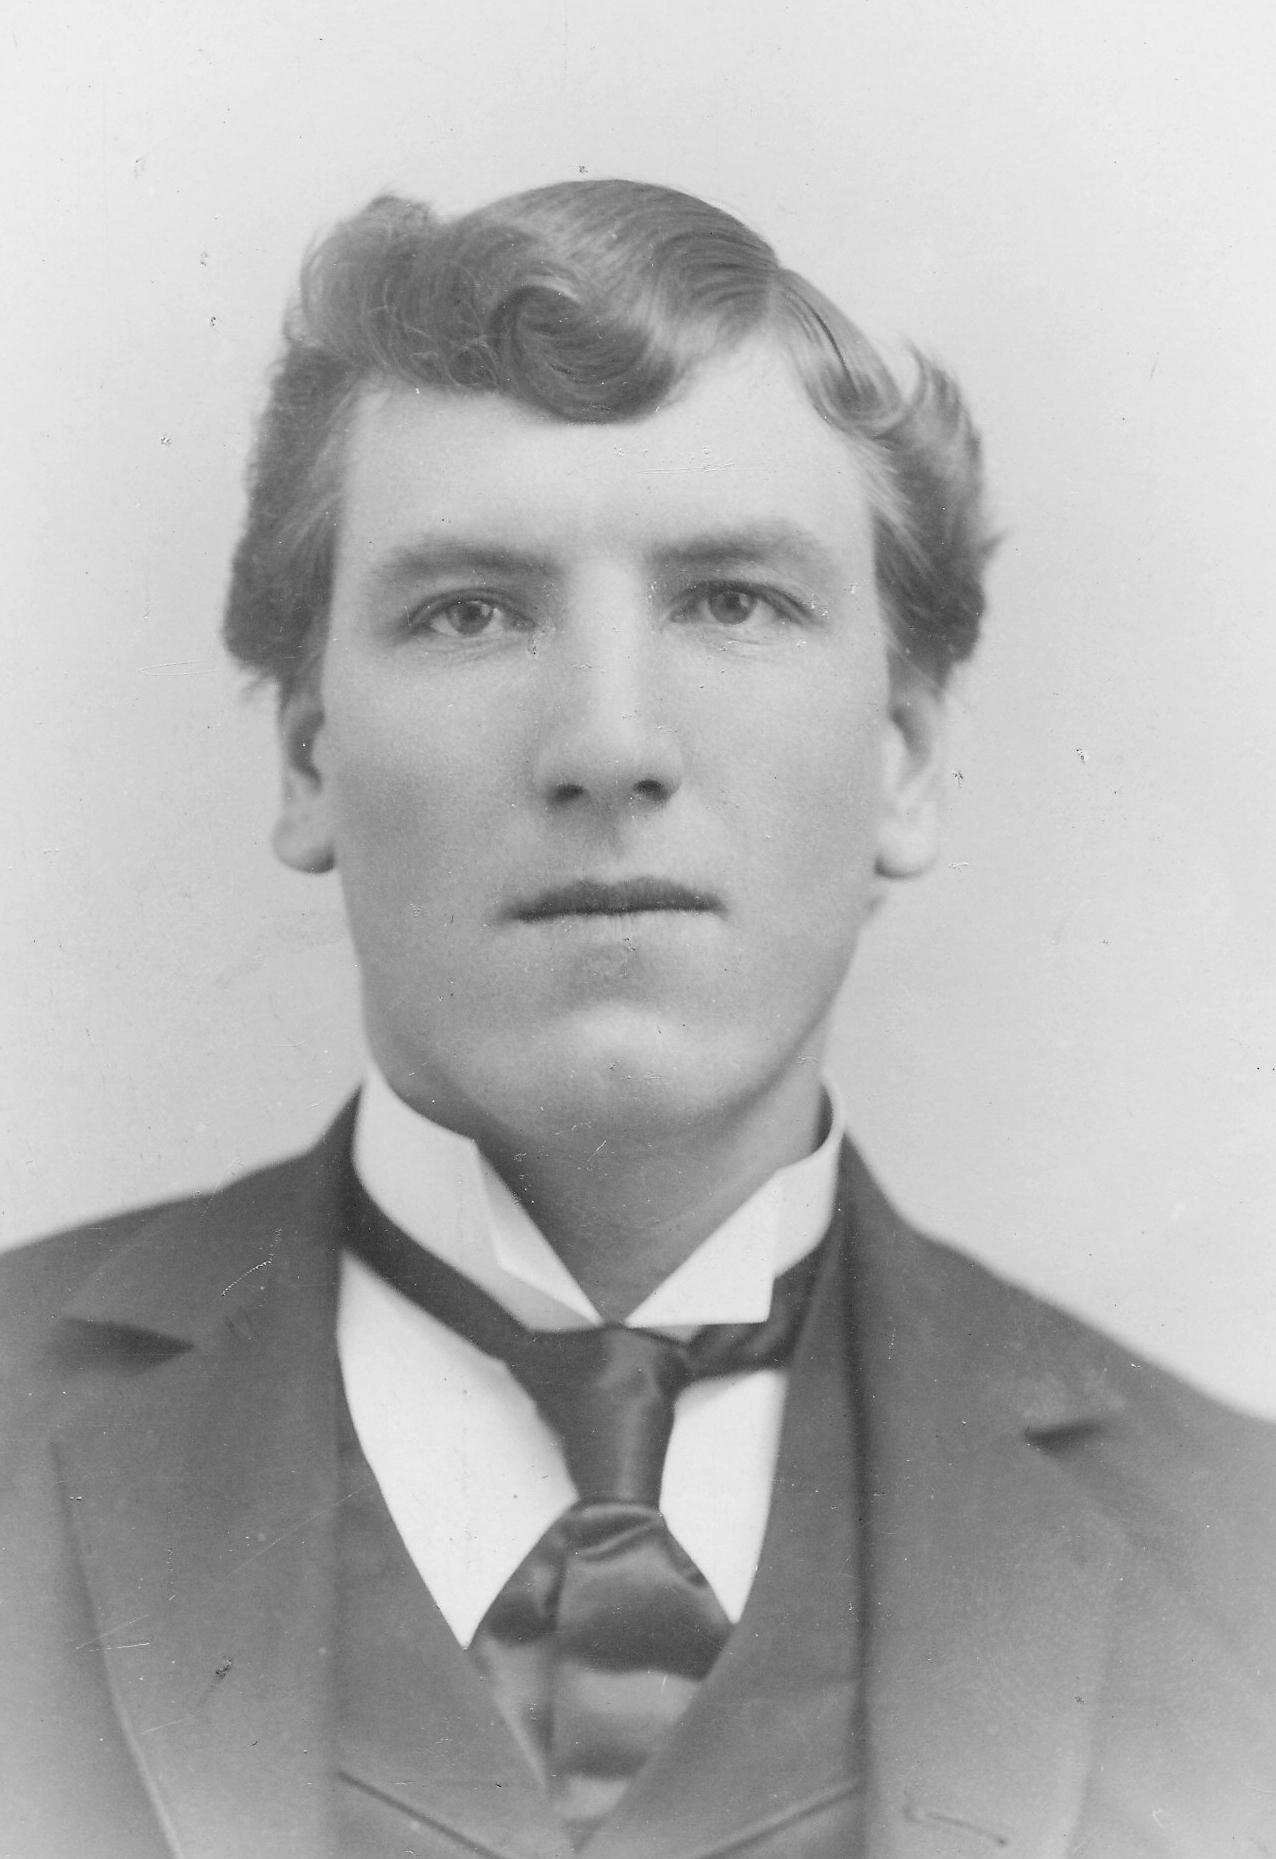 Heaton, William Hoyt